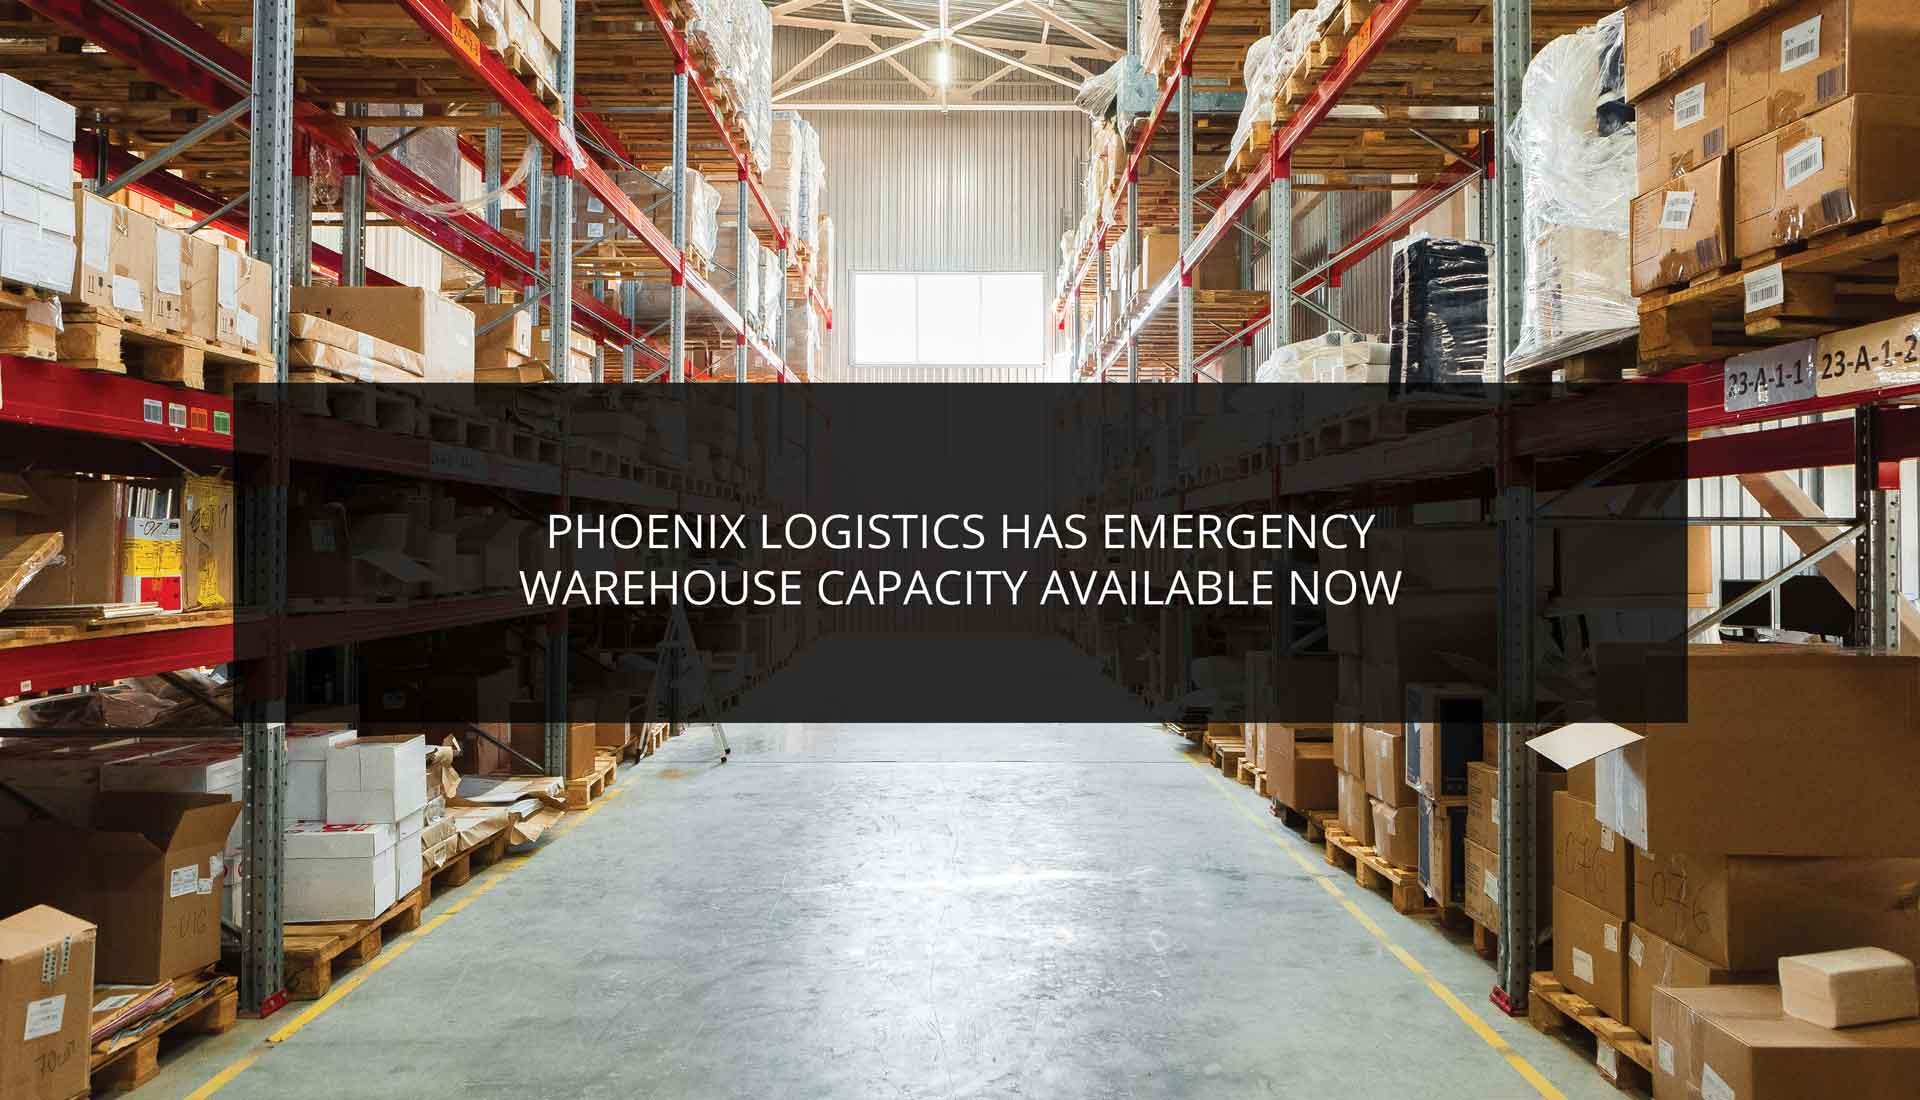 Phoenix Logistics Has Emergency Warehouse Capacity Available Now